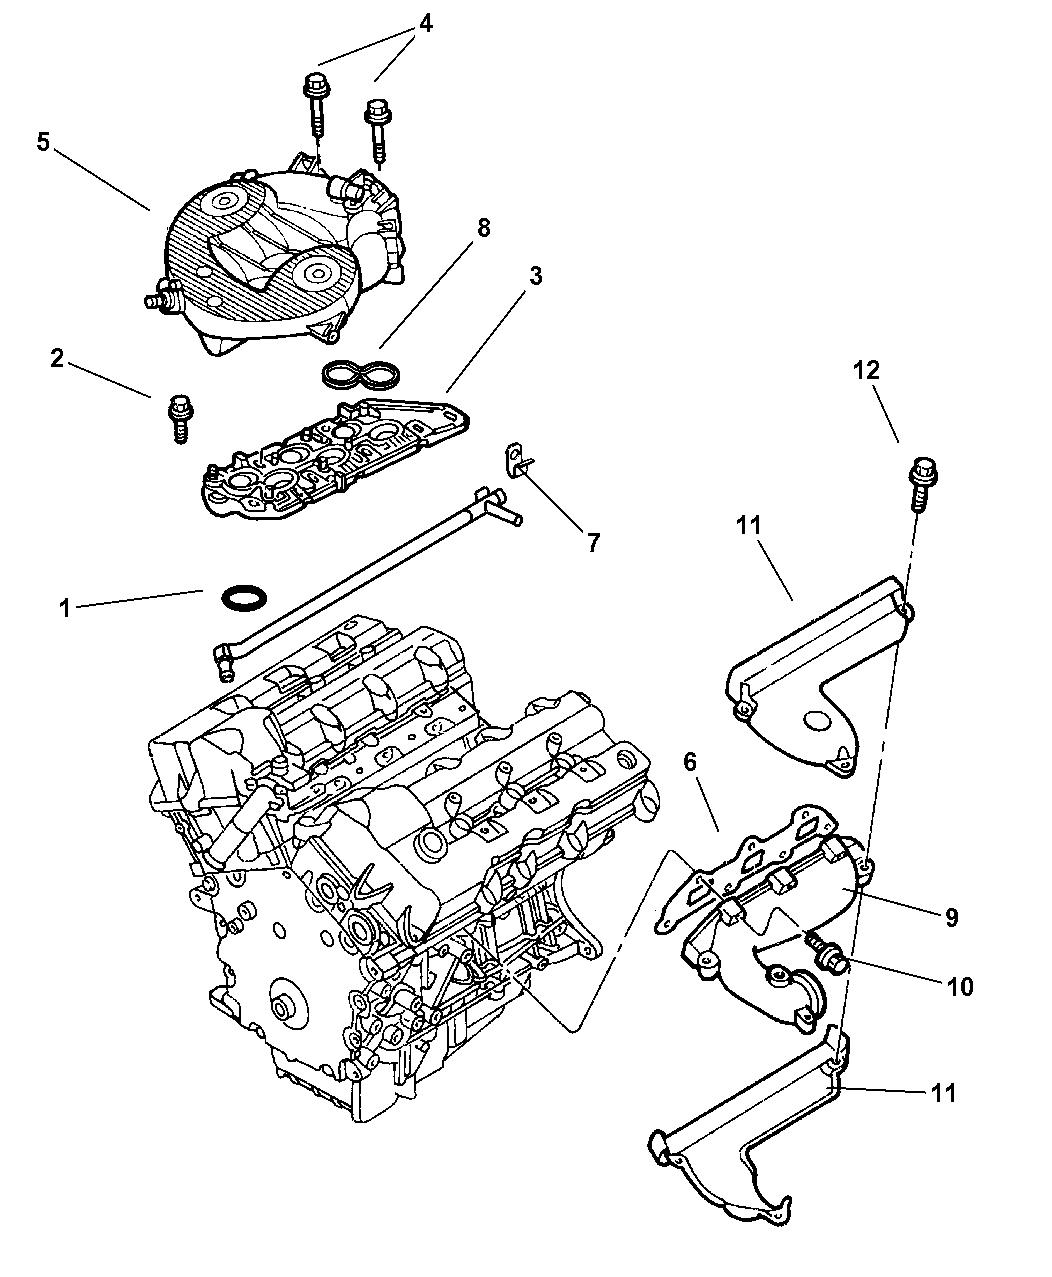 2001 Dodge Intrepid Manifold Intake Exhaust Wiring Harness Thumbnail 1